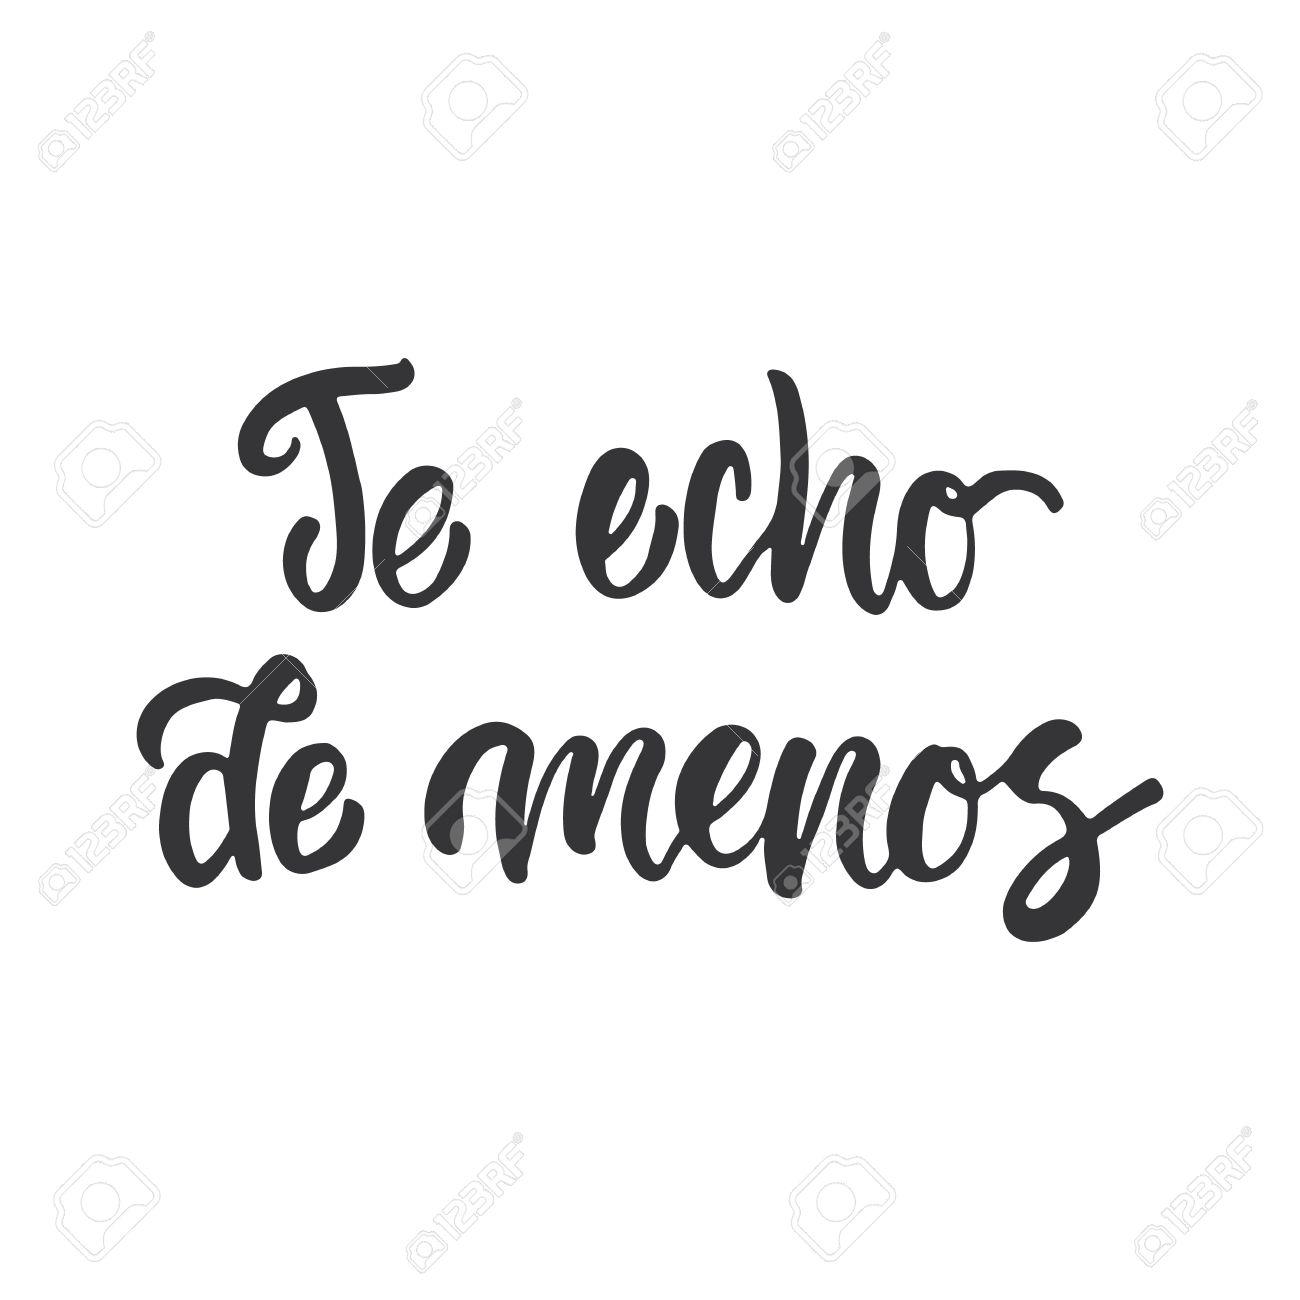 Te extrano i miss you lettering calligraphy phrase in spanish te extrano i miss you lettering calligraphy phrase in spanish handwritten text isolated altavistaventures Gallery